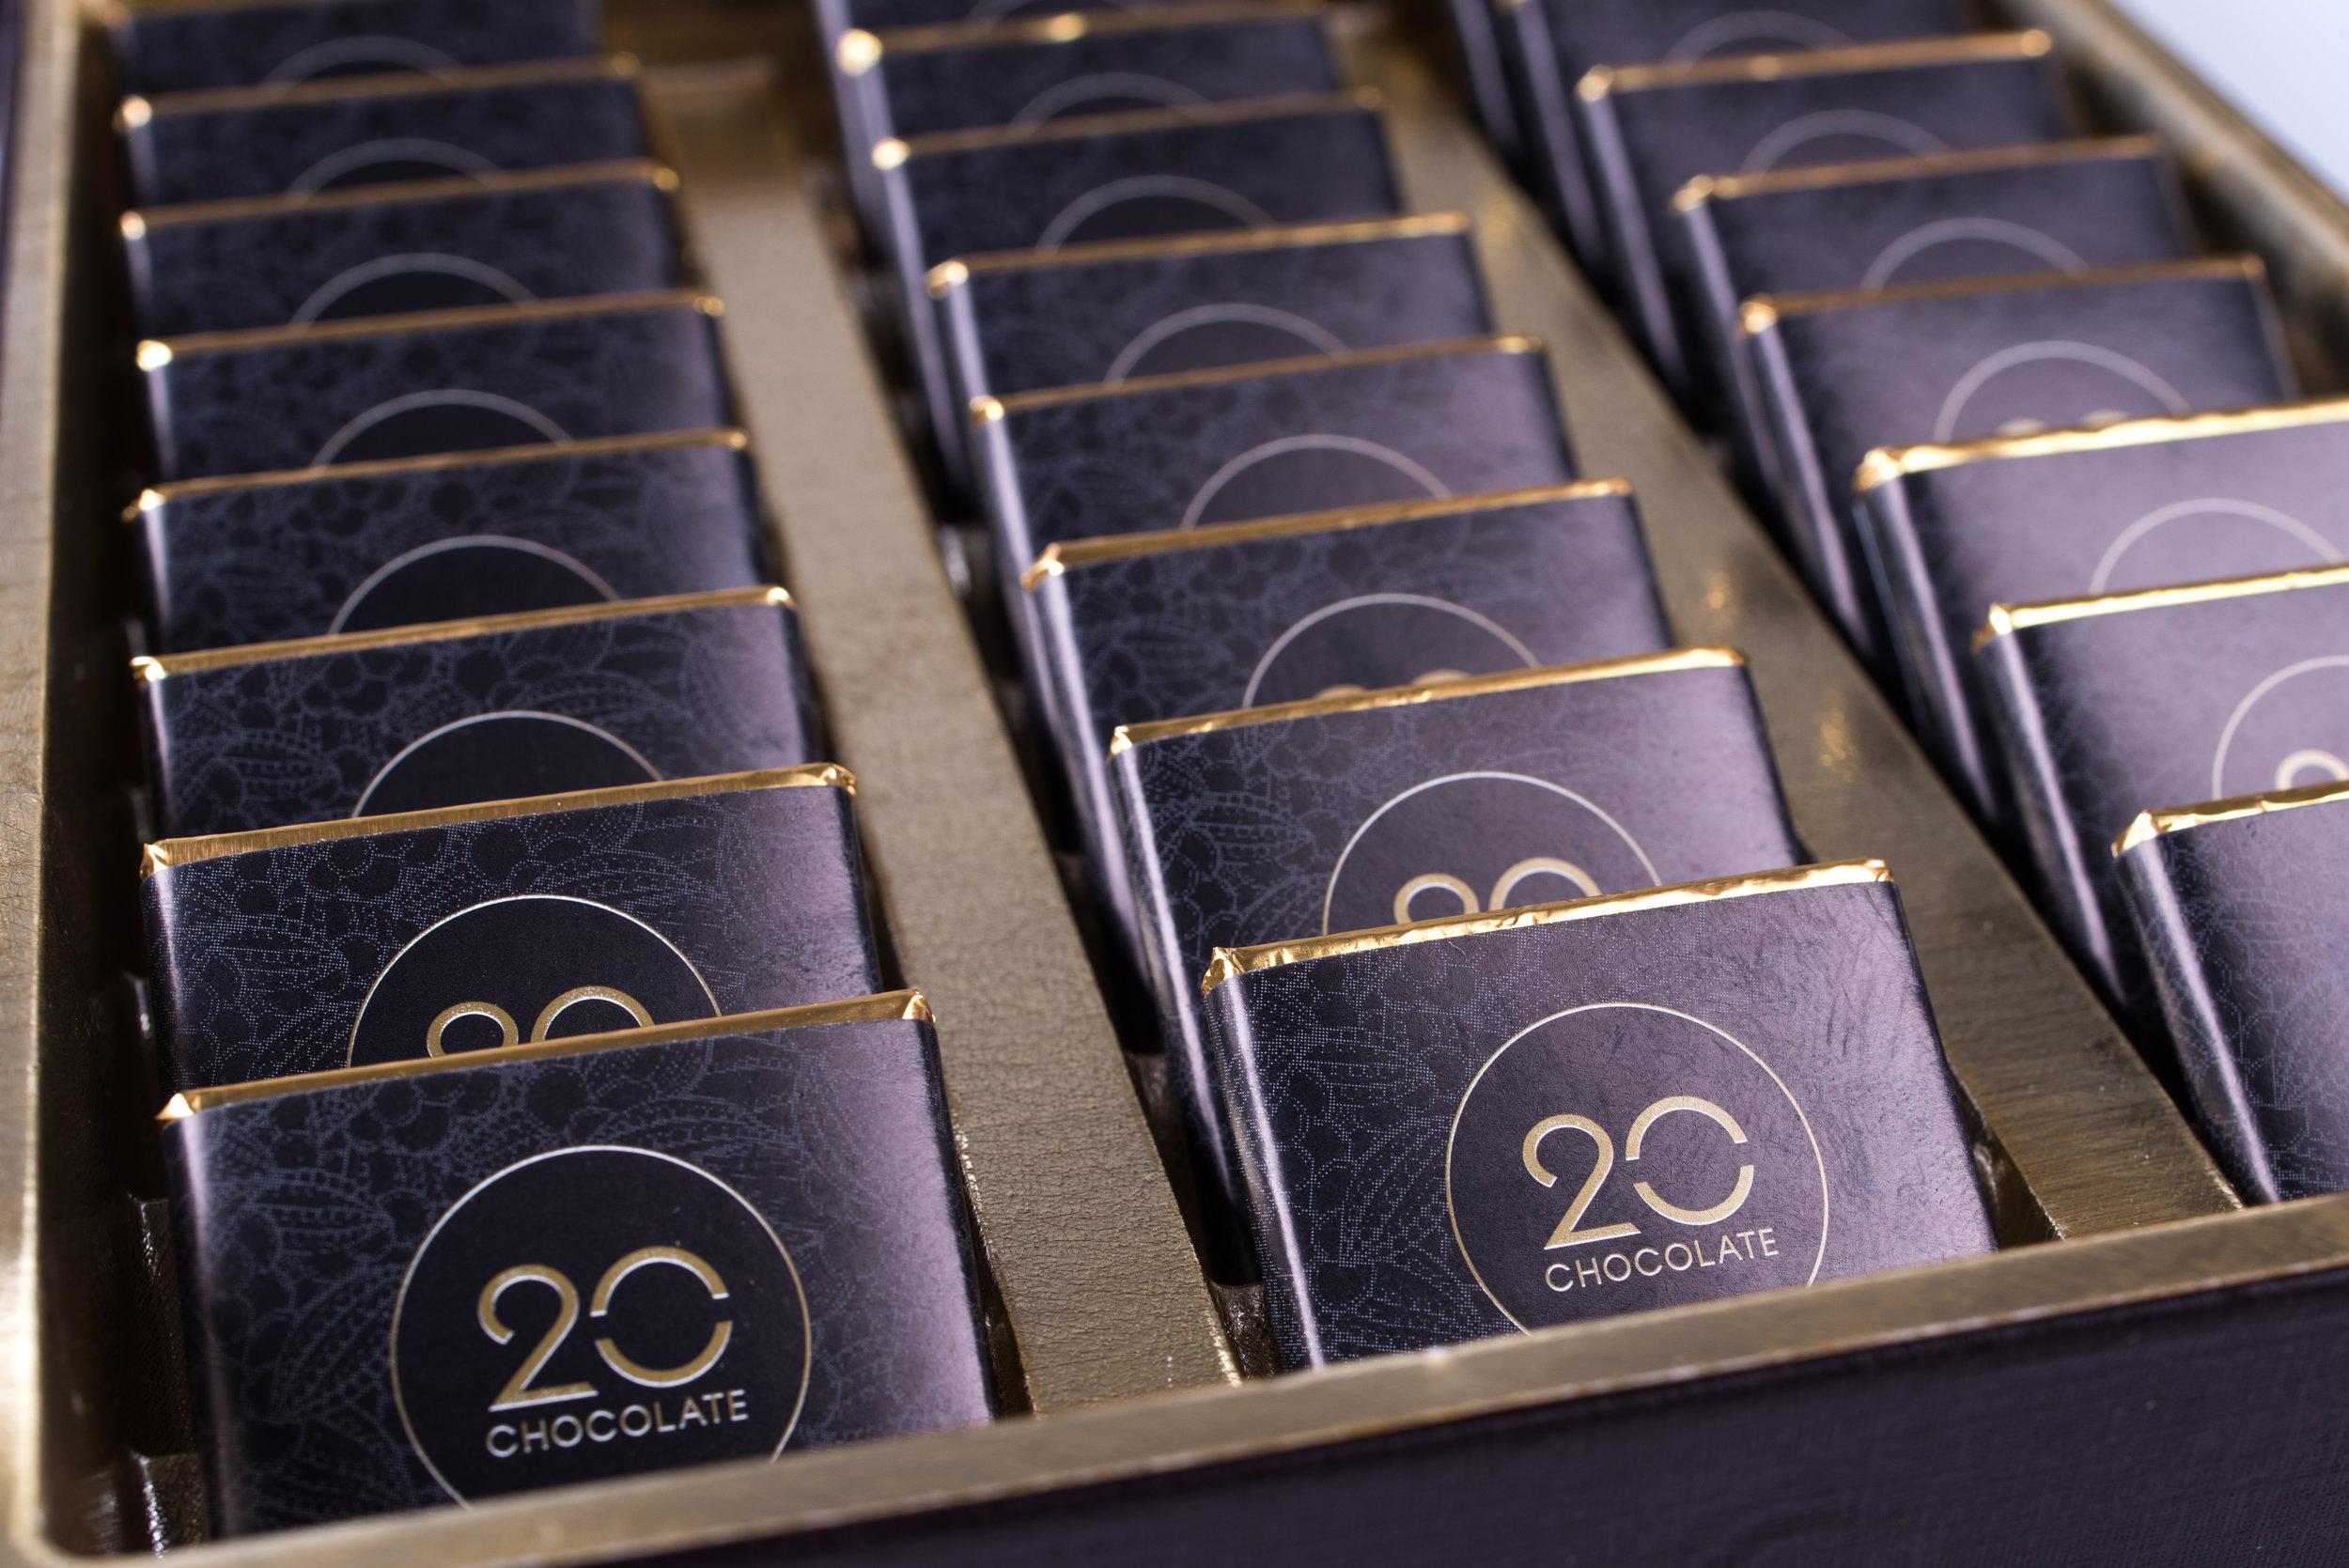 20chocolate-21.jpg